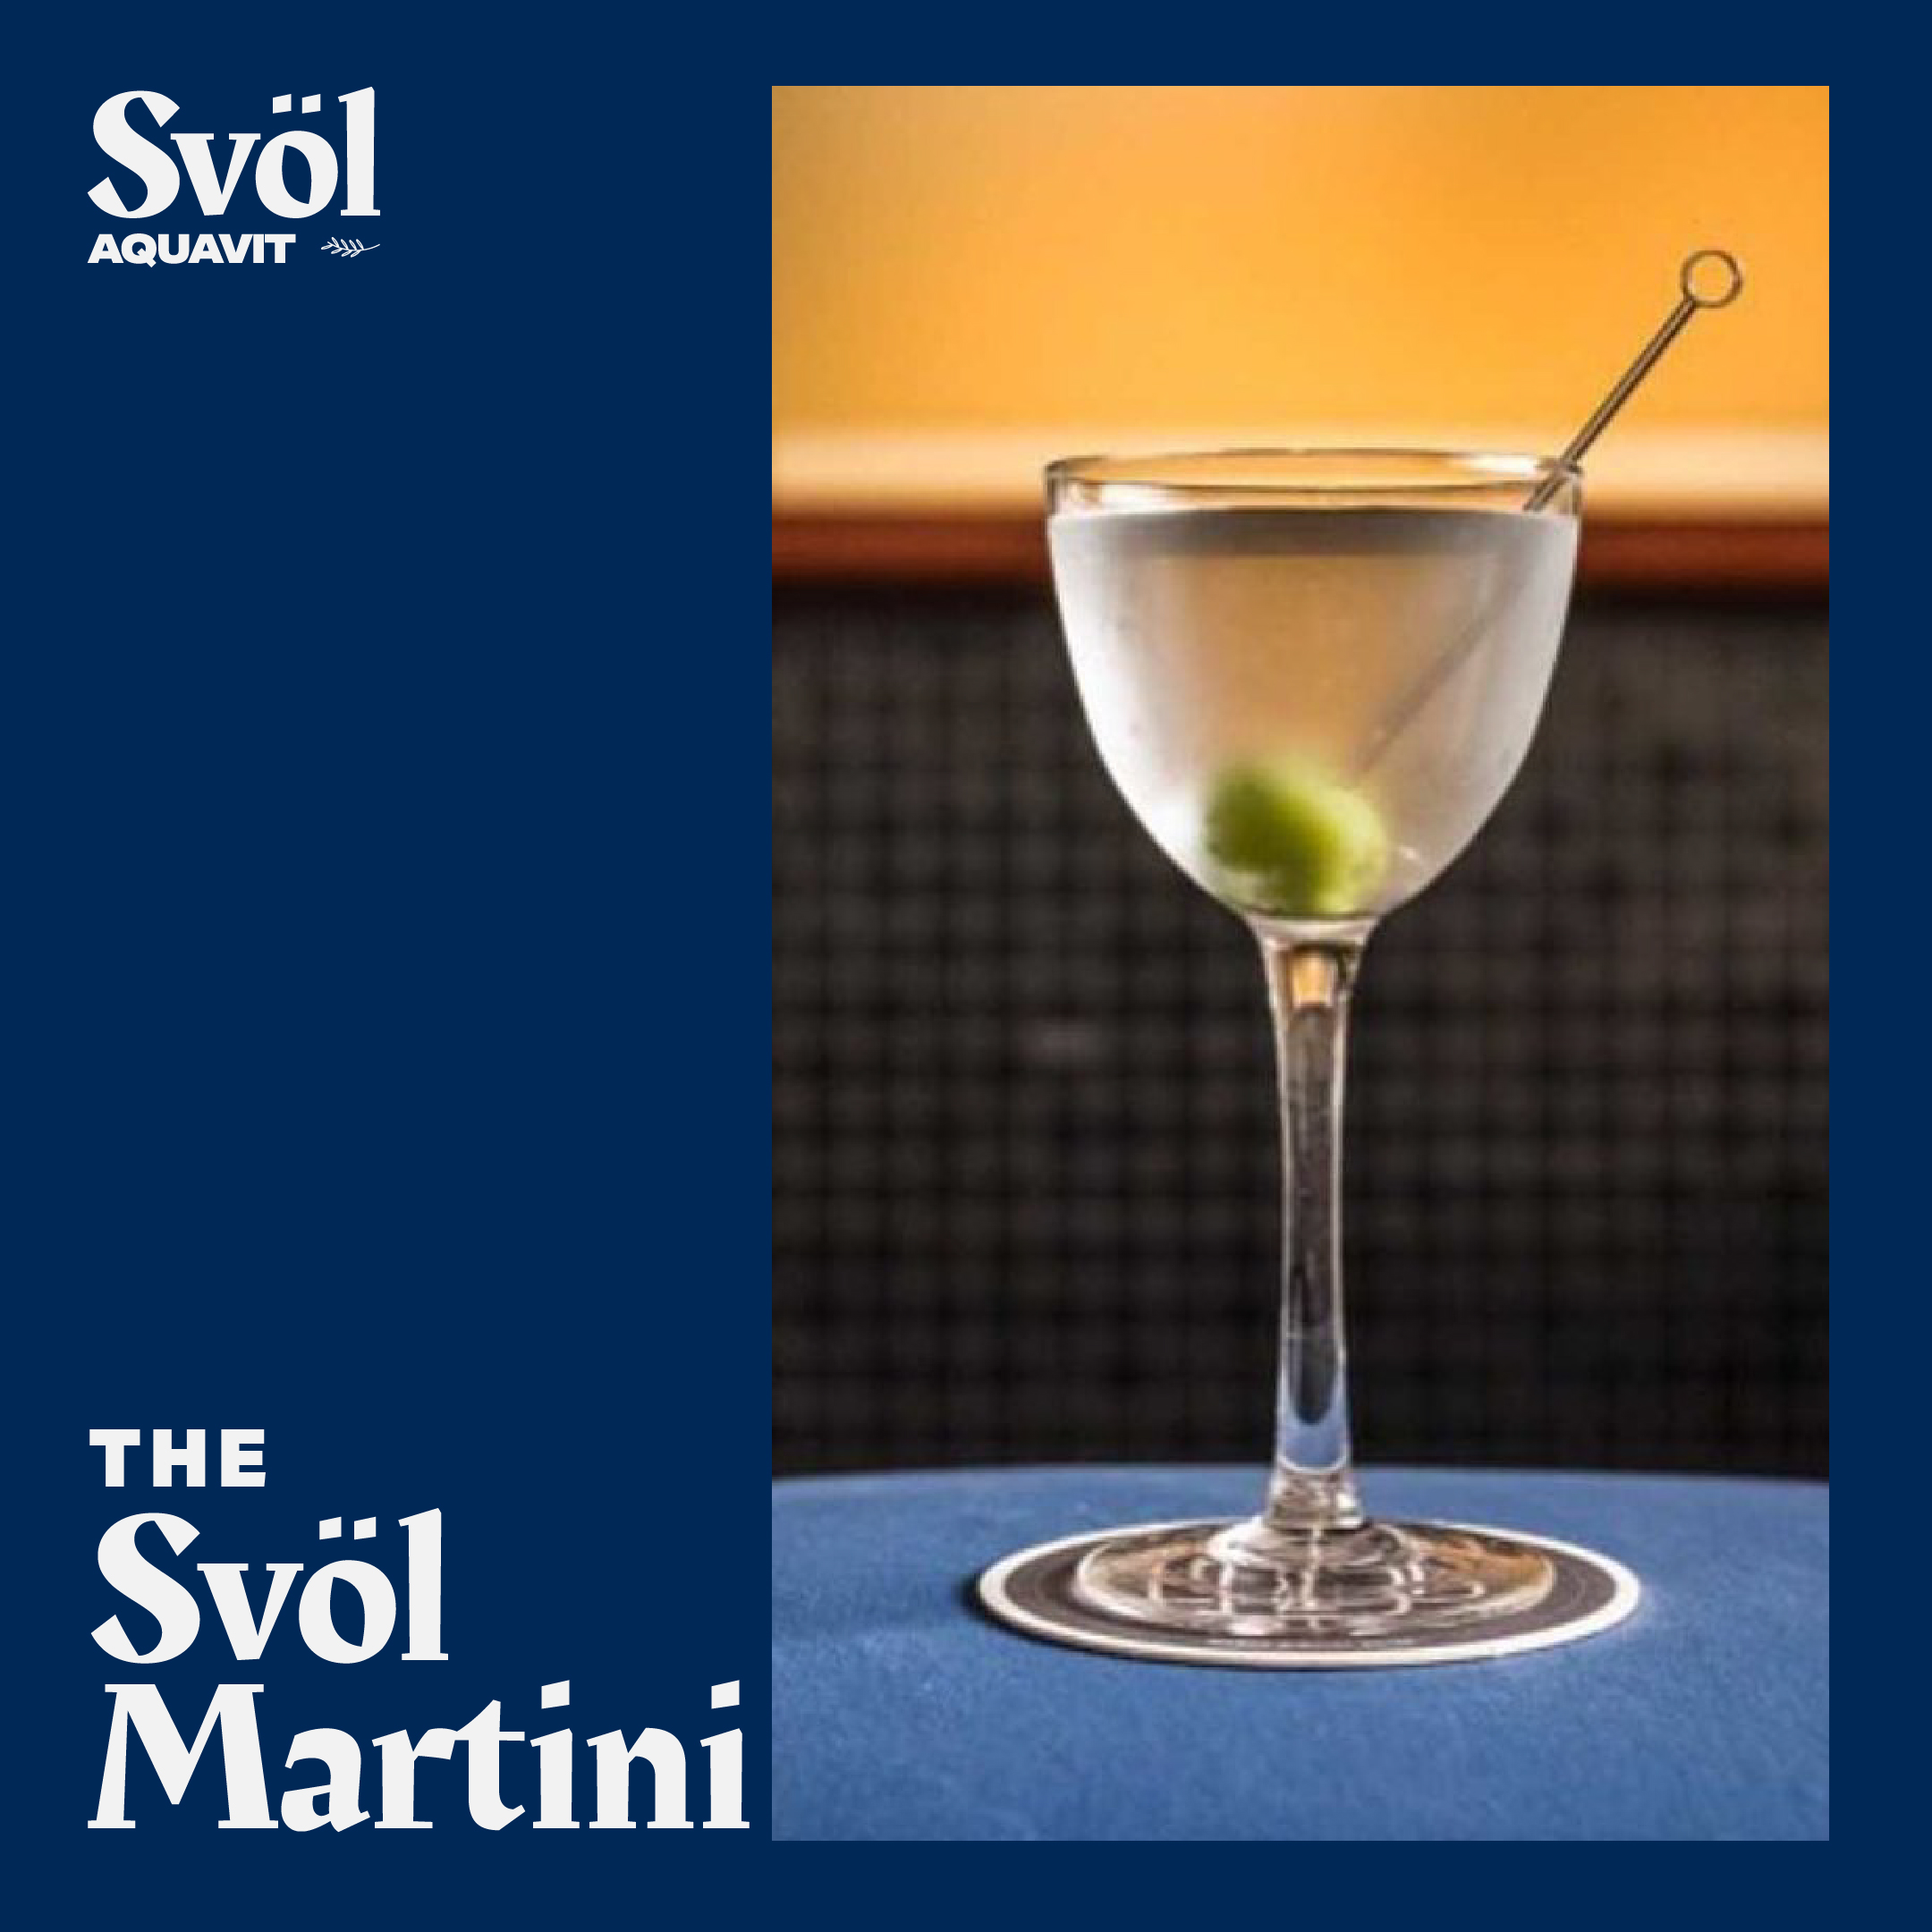 Svol_Cocktail_Template_SvolMartini.jpg